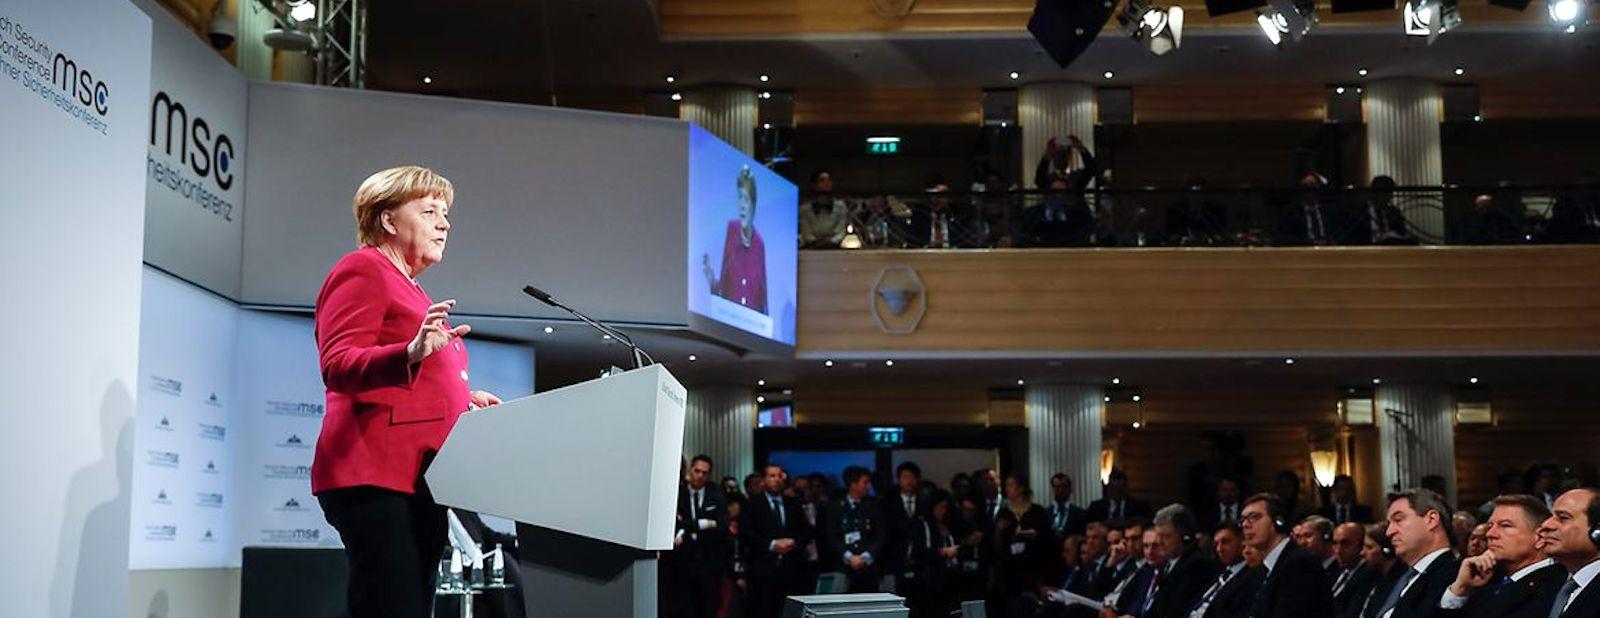 German Chancellor Angela Merkel speaks at the Munich Security Conference (Photo: Bundesregierung/Denzel)